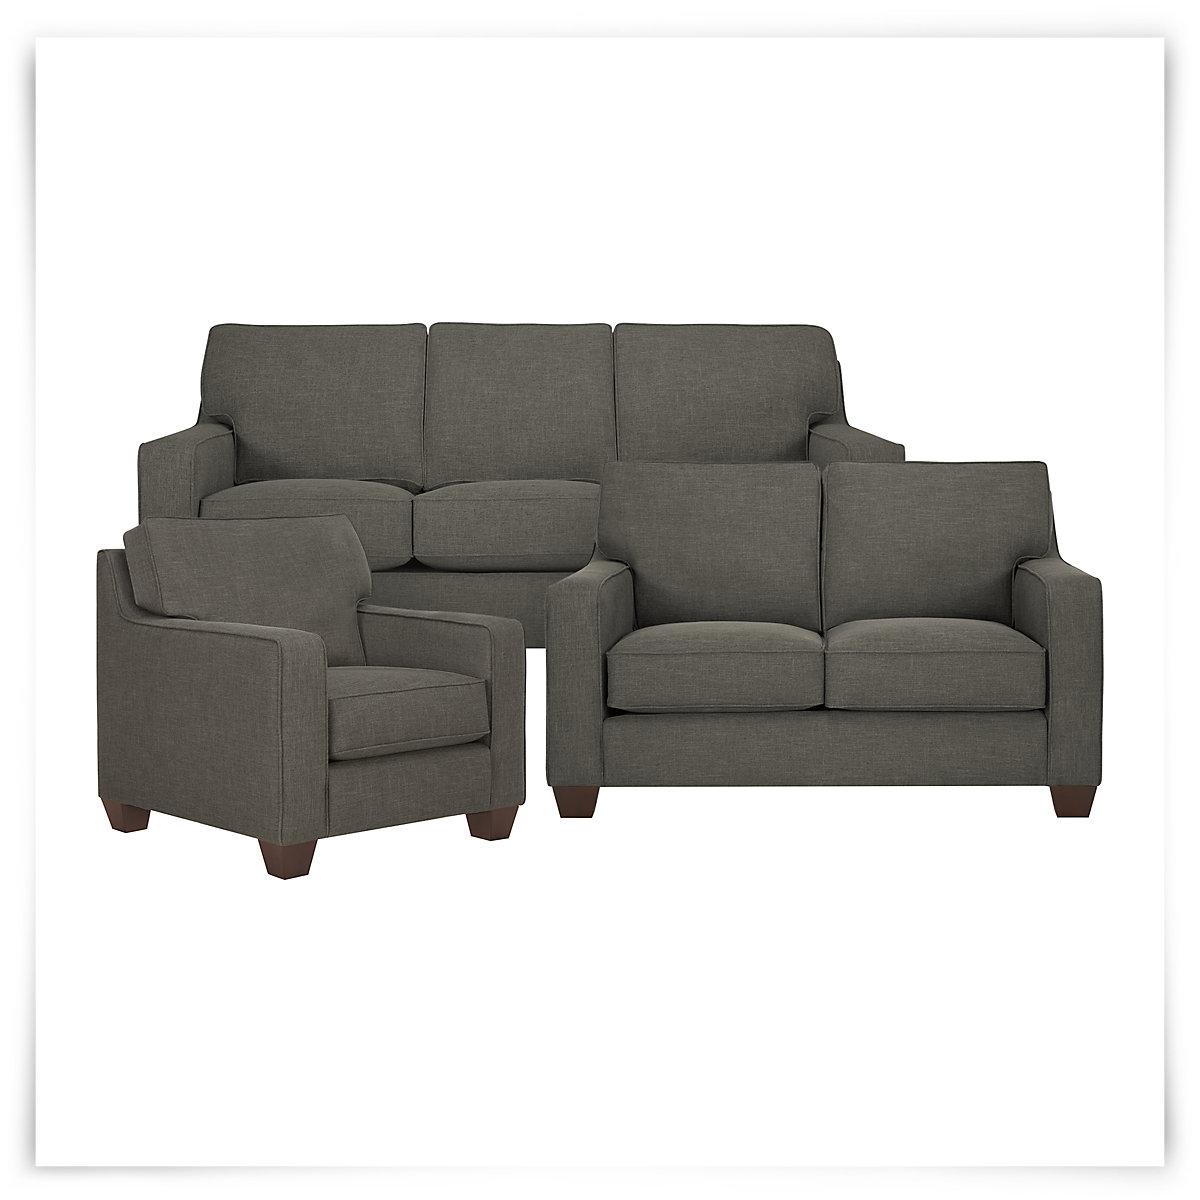 City Furniture York Dk Gray Fabric Loveseat